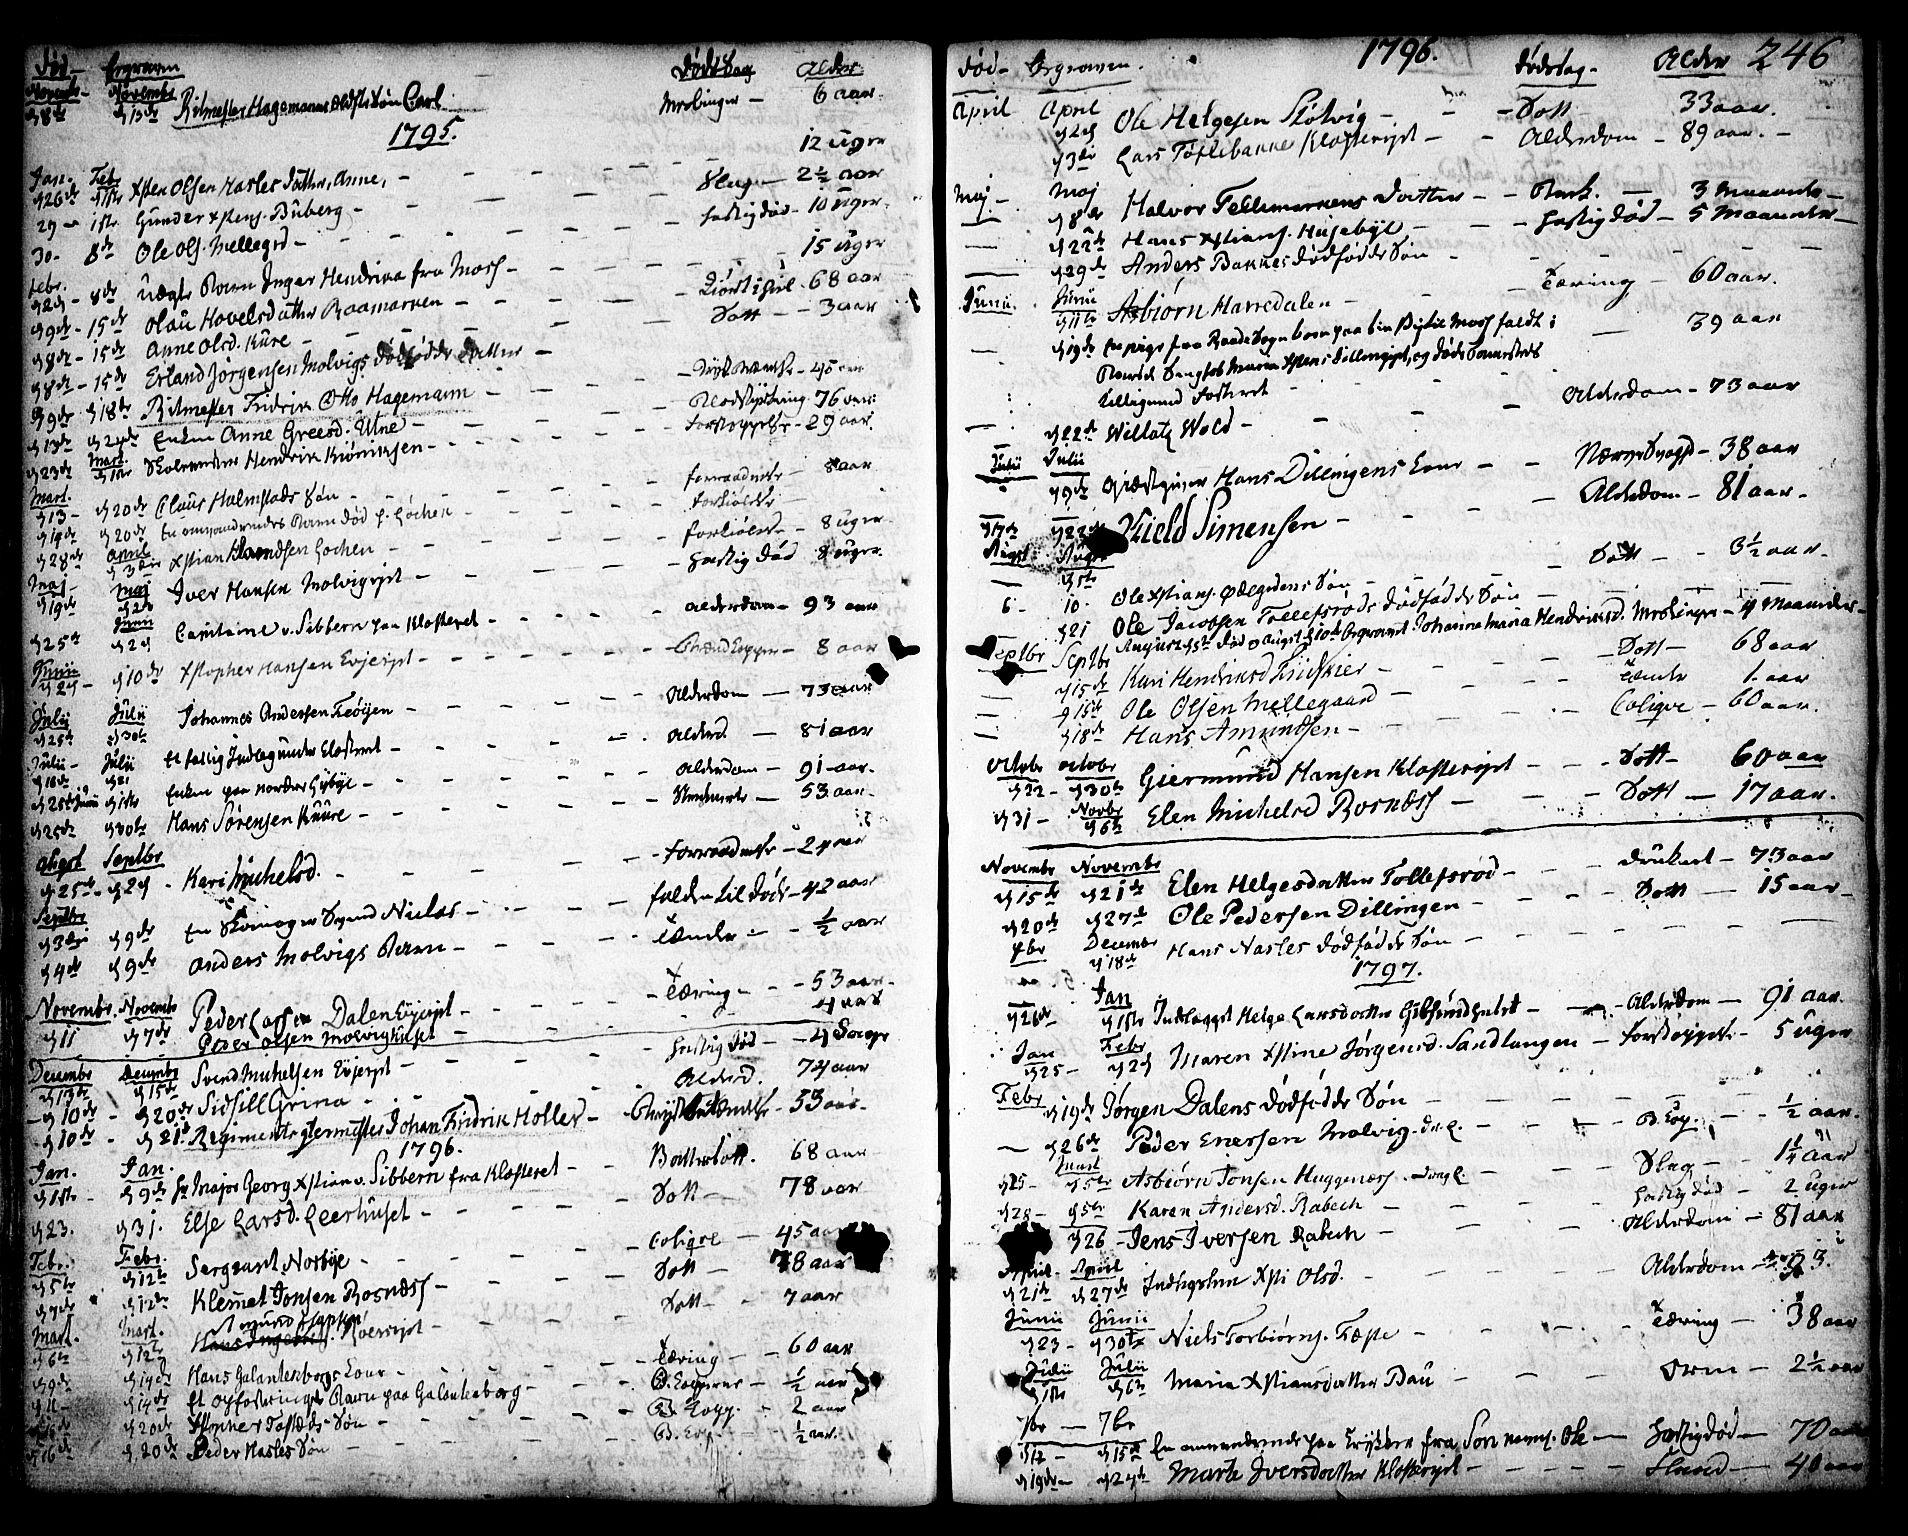 SAO, Rygge prestekontor Kirkebøker, F/Fa/L0002: Parish register (official) no. 2, 1771-1814, p. 246